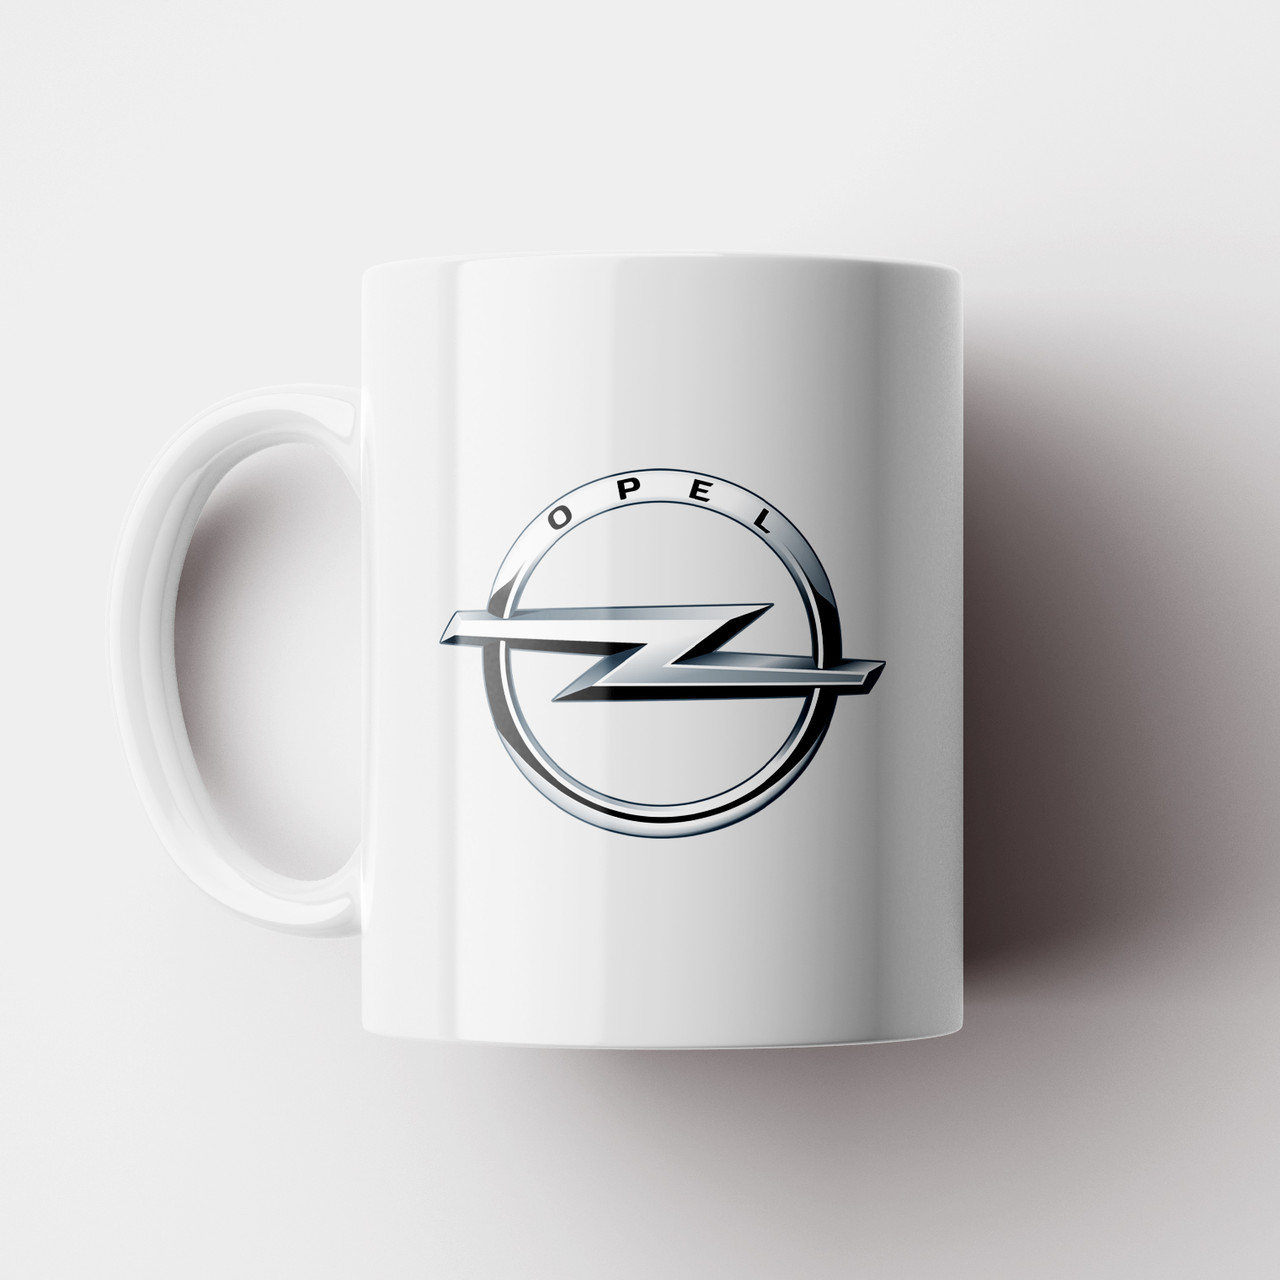 Кружка Opel. Опель